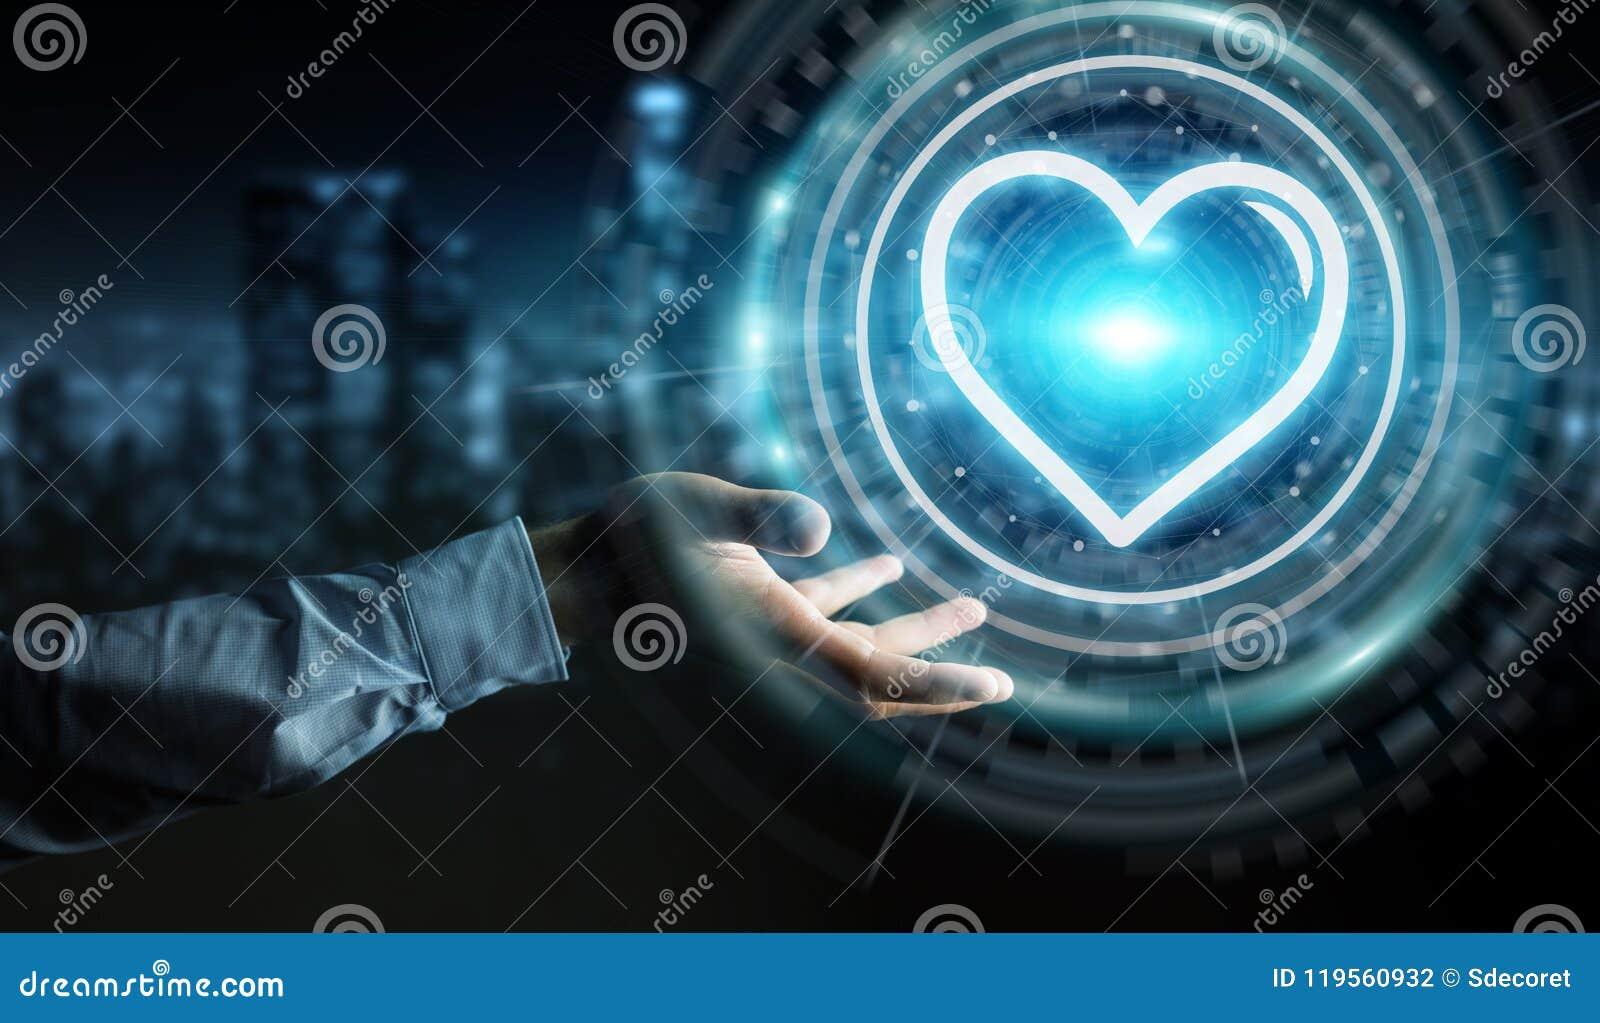 love 3d online